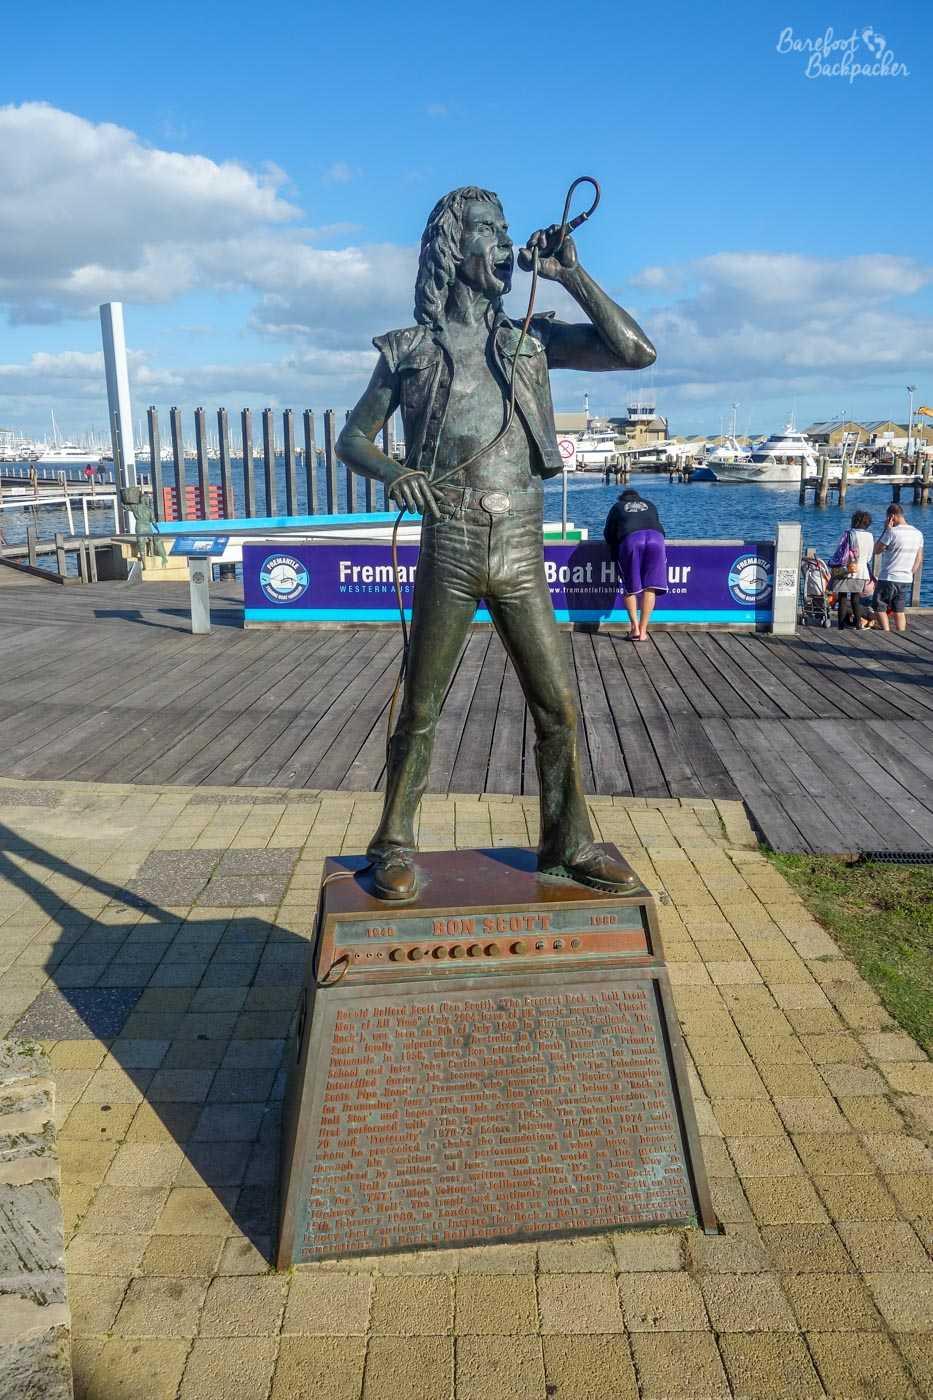 Statue of AC/DC vocalist/lyricist Bon Scott, who made Fremantle his home.